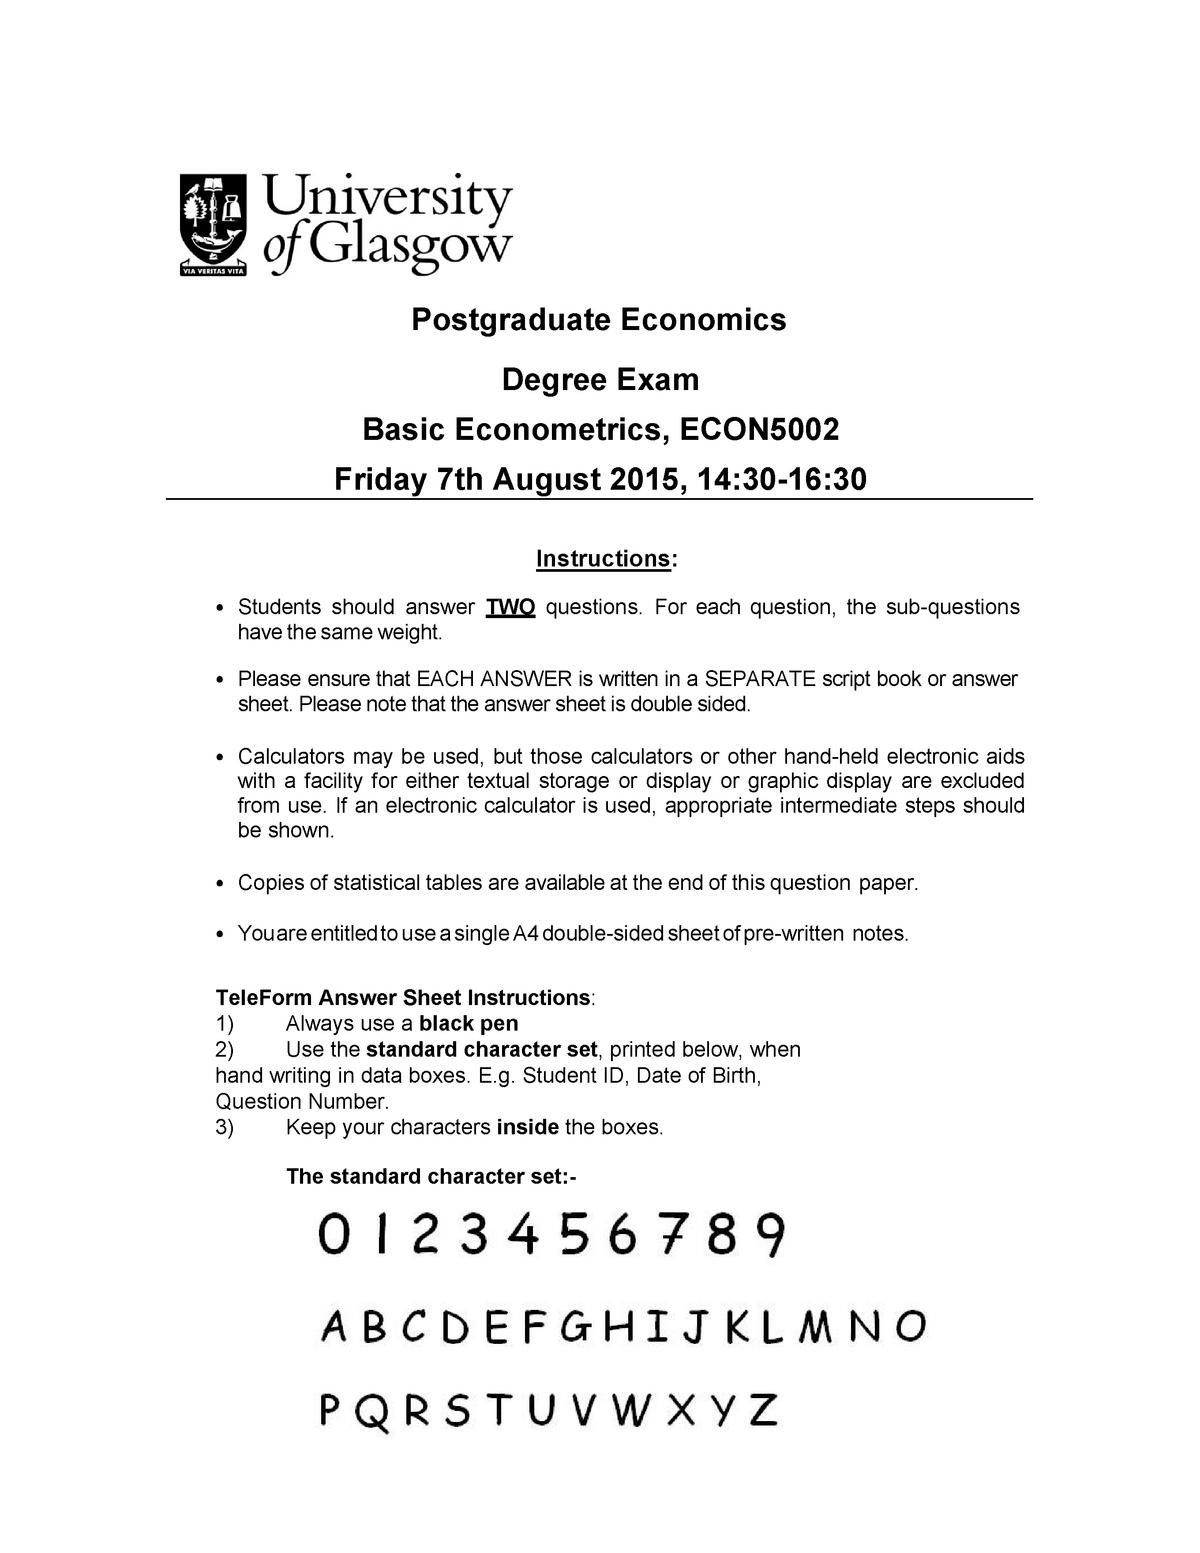 Exam 2015 - ECON5002: Basic Econometrics - StuDocu